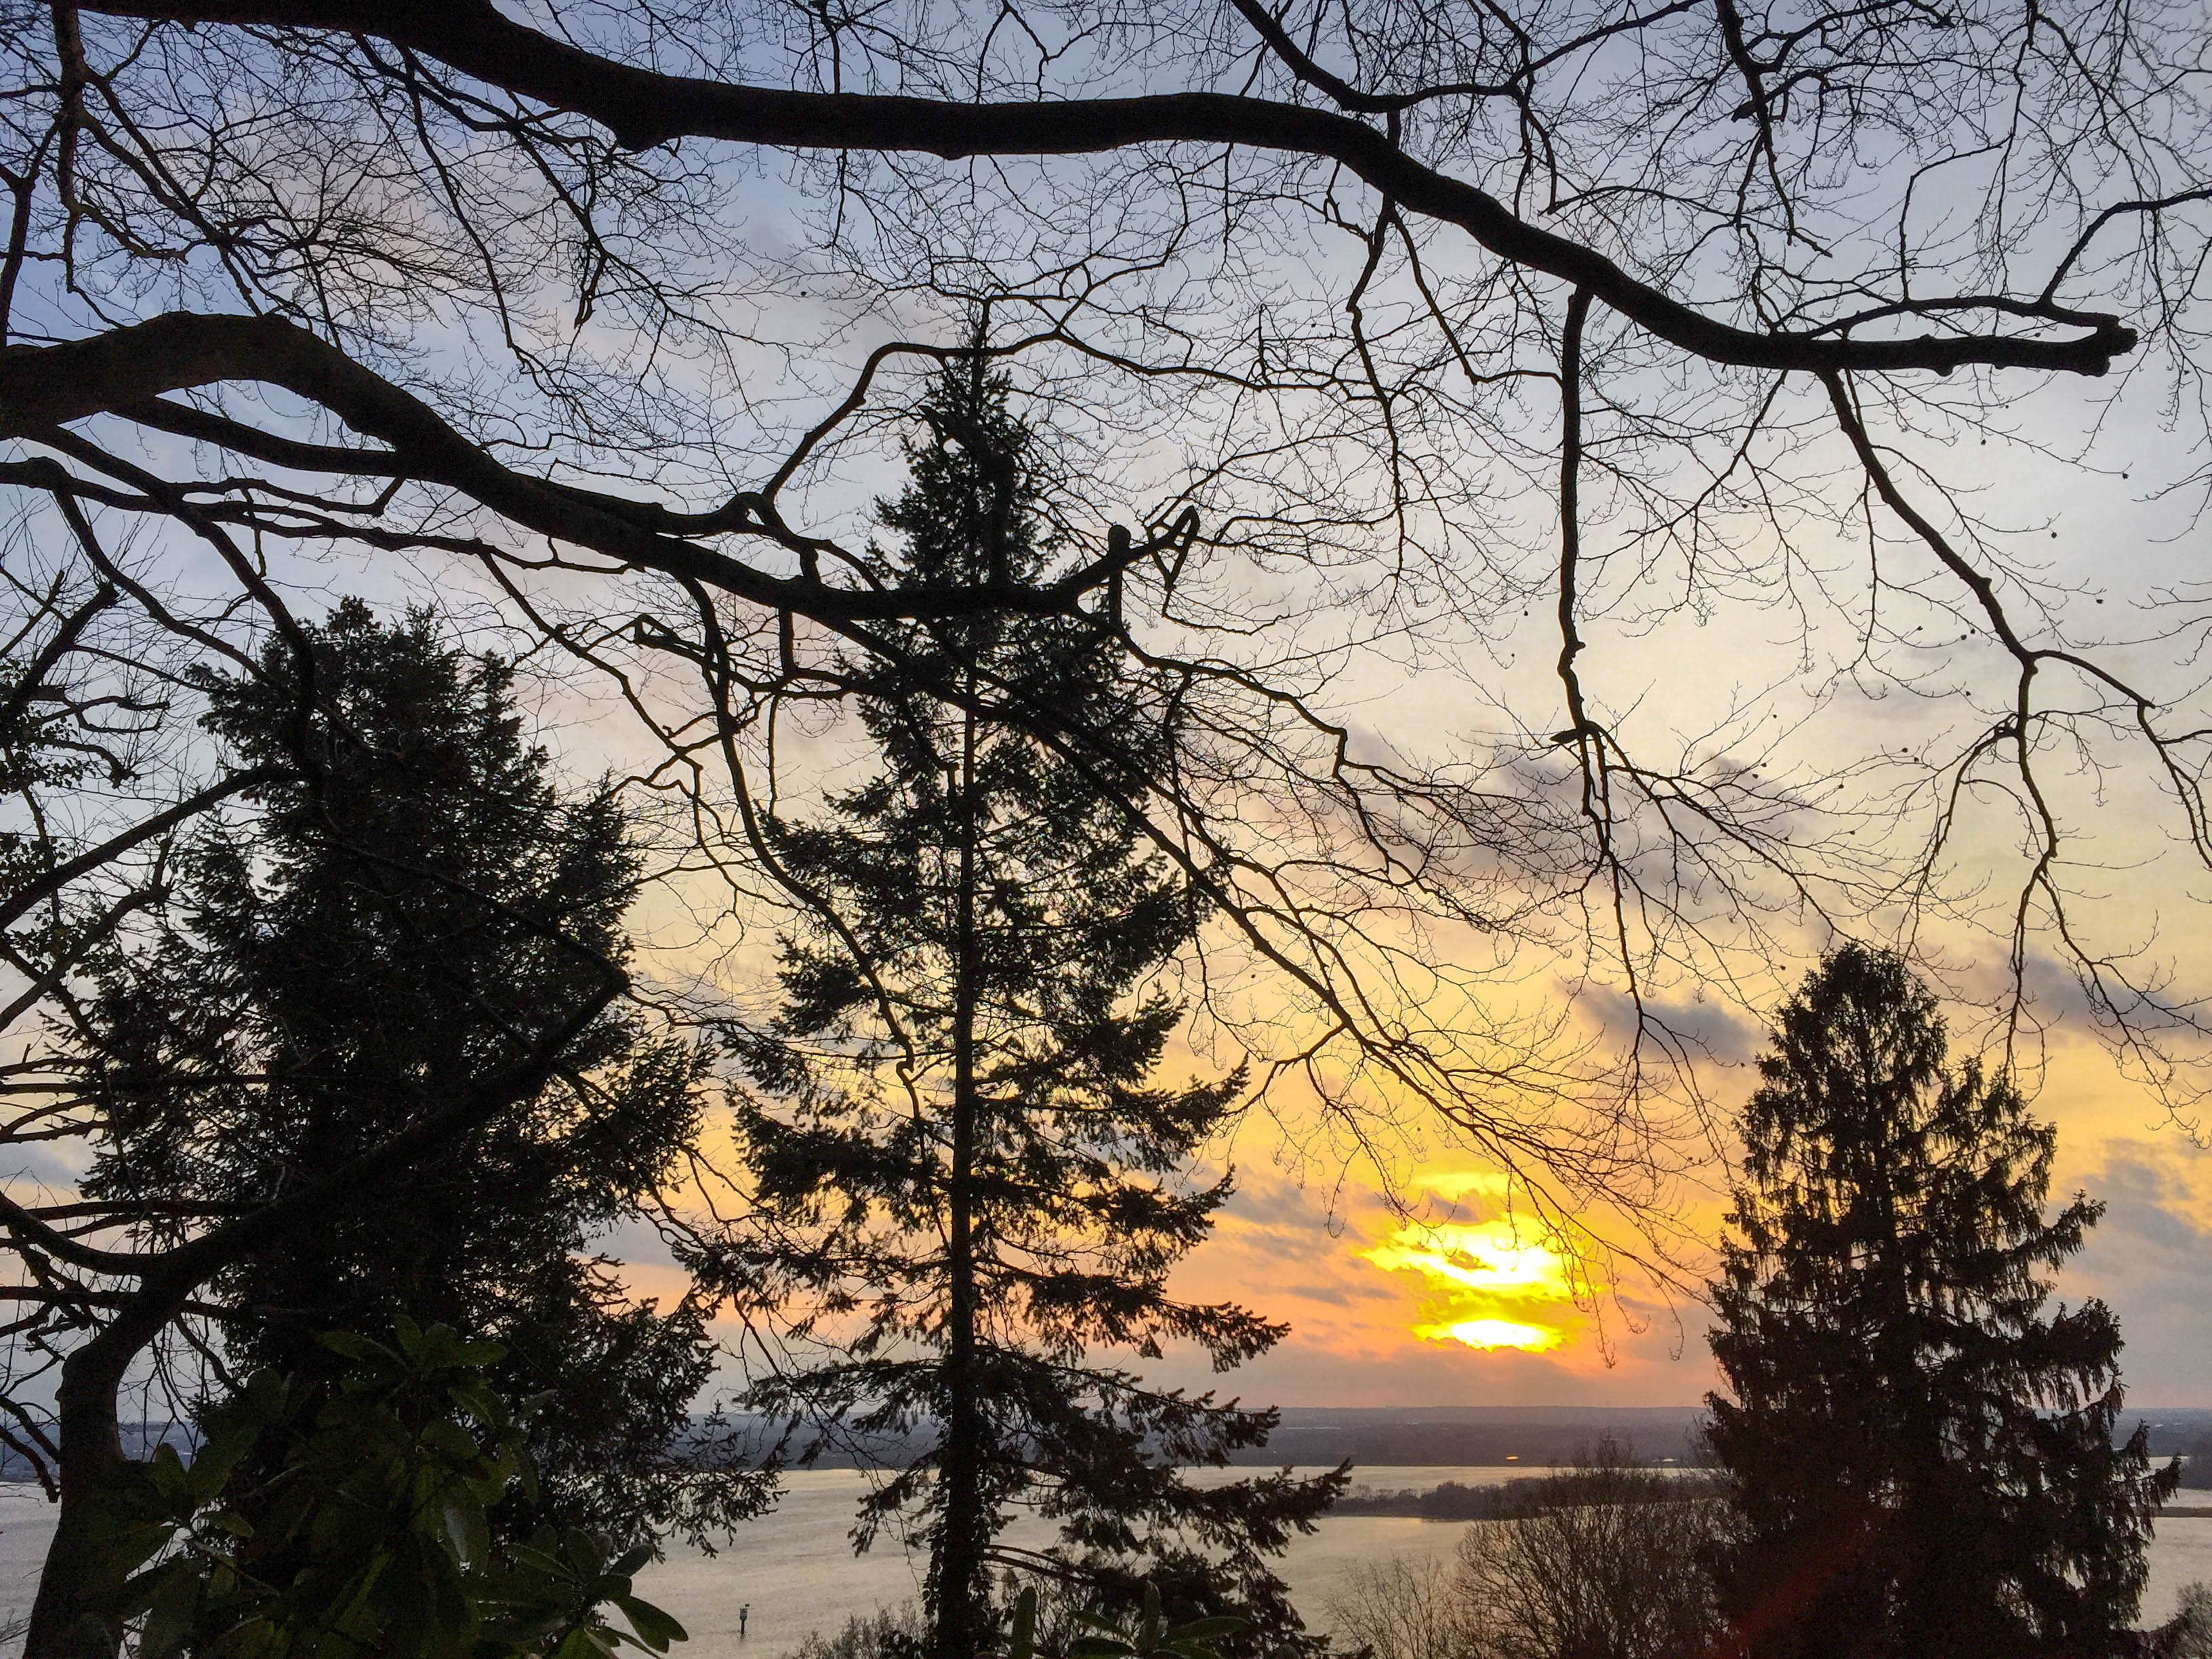 Sonnenuntergang Tanne Elbe